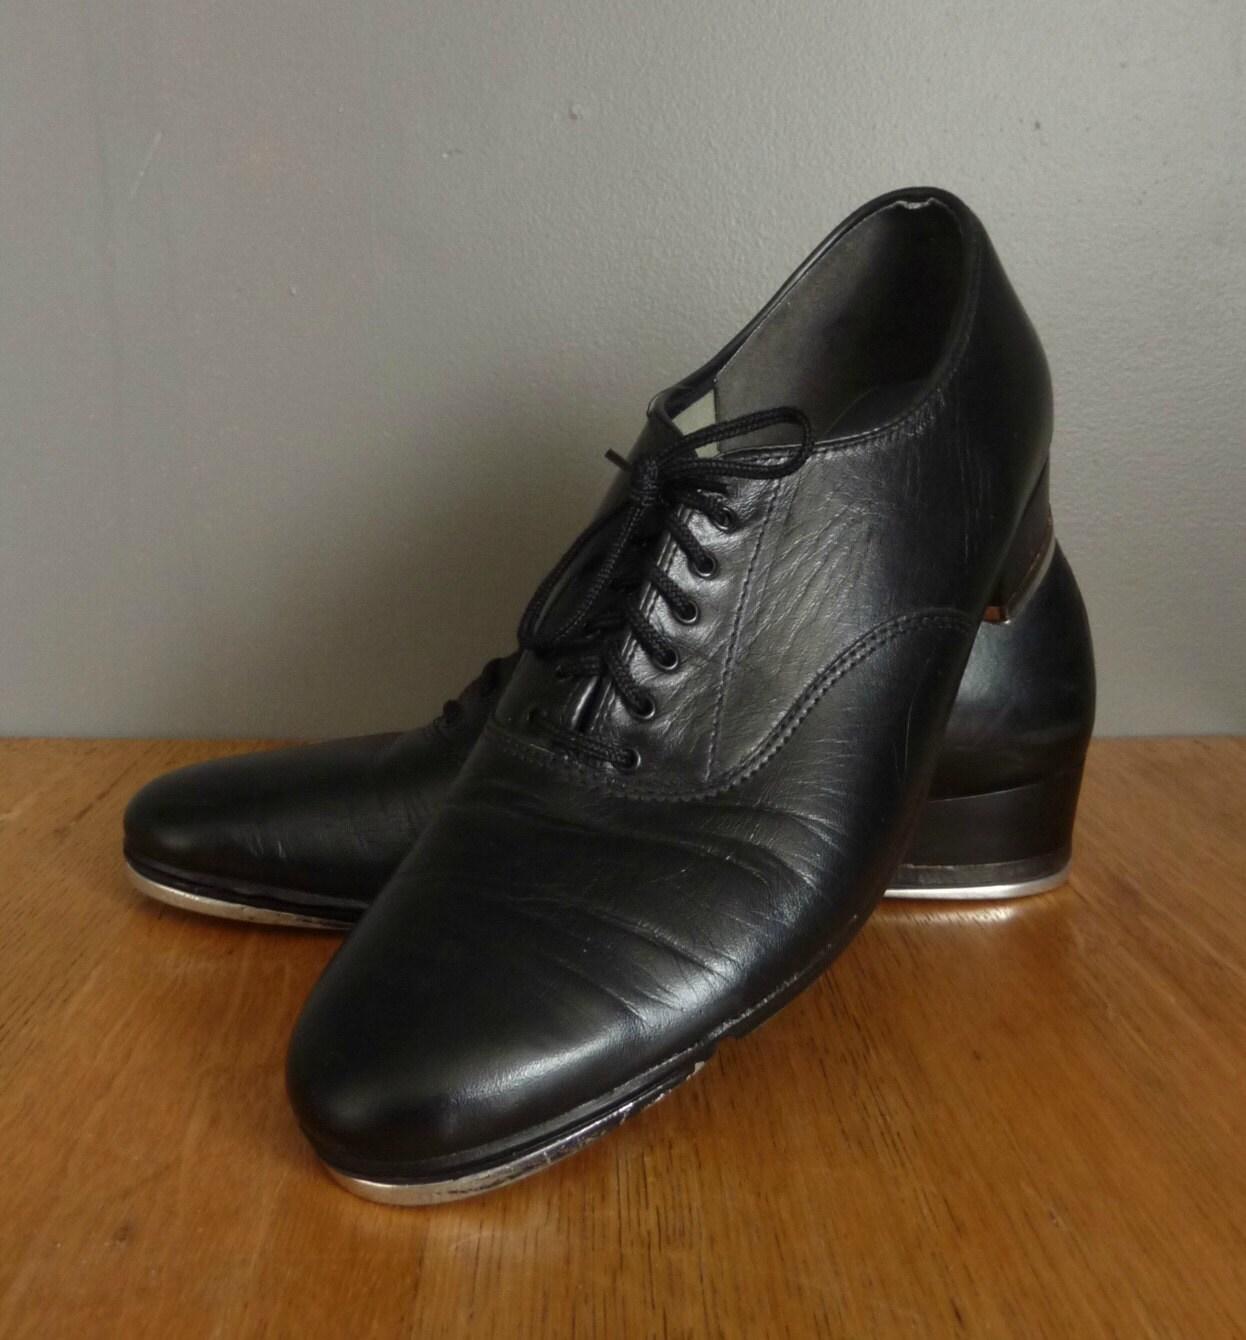 Vintage black capezio tap dancing shoes size women s 8 can you say